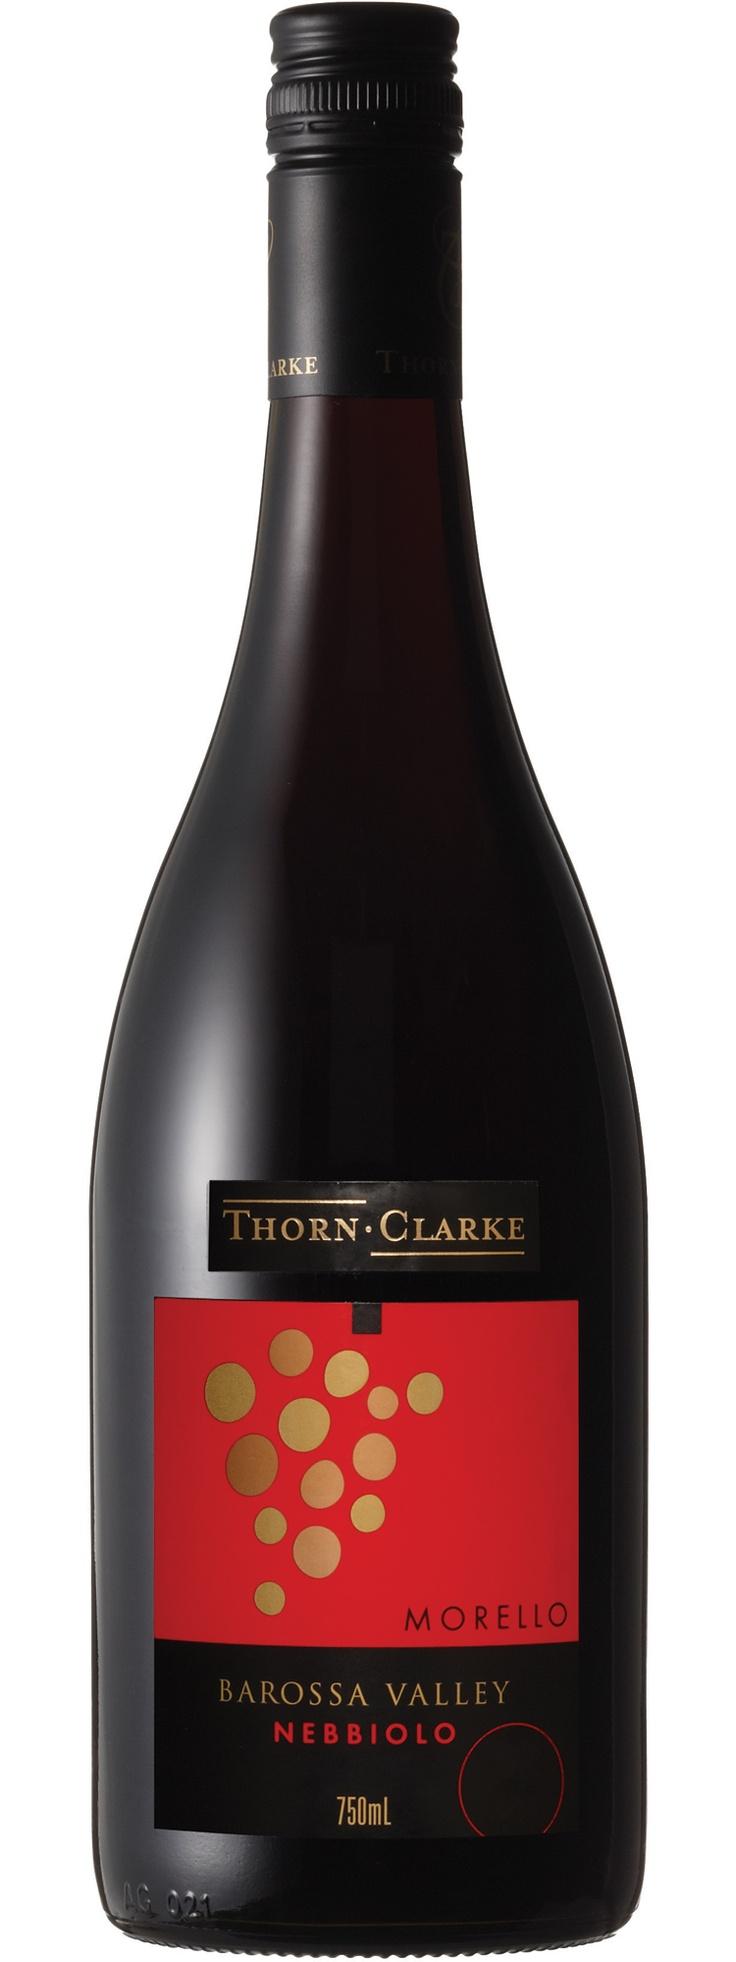 Thorn-Clarke Morello Nebbiolo | Dan Murphy's | Buy Wine, Champagne, Beer & Spirits Online